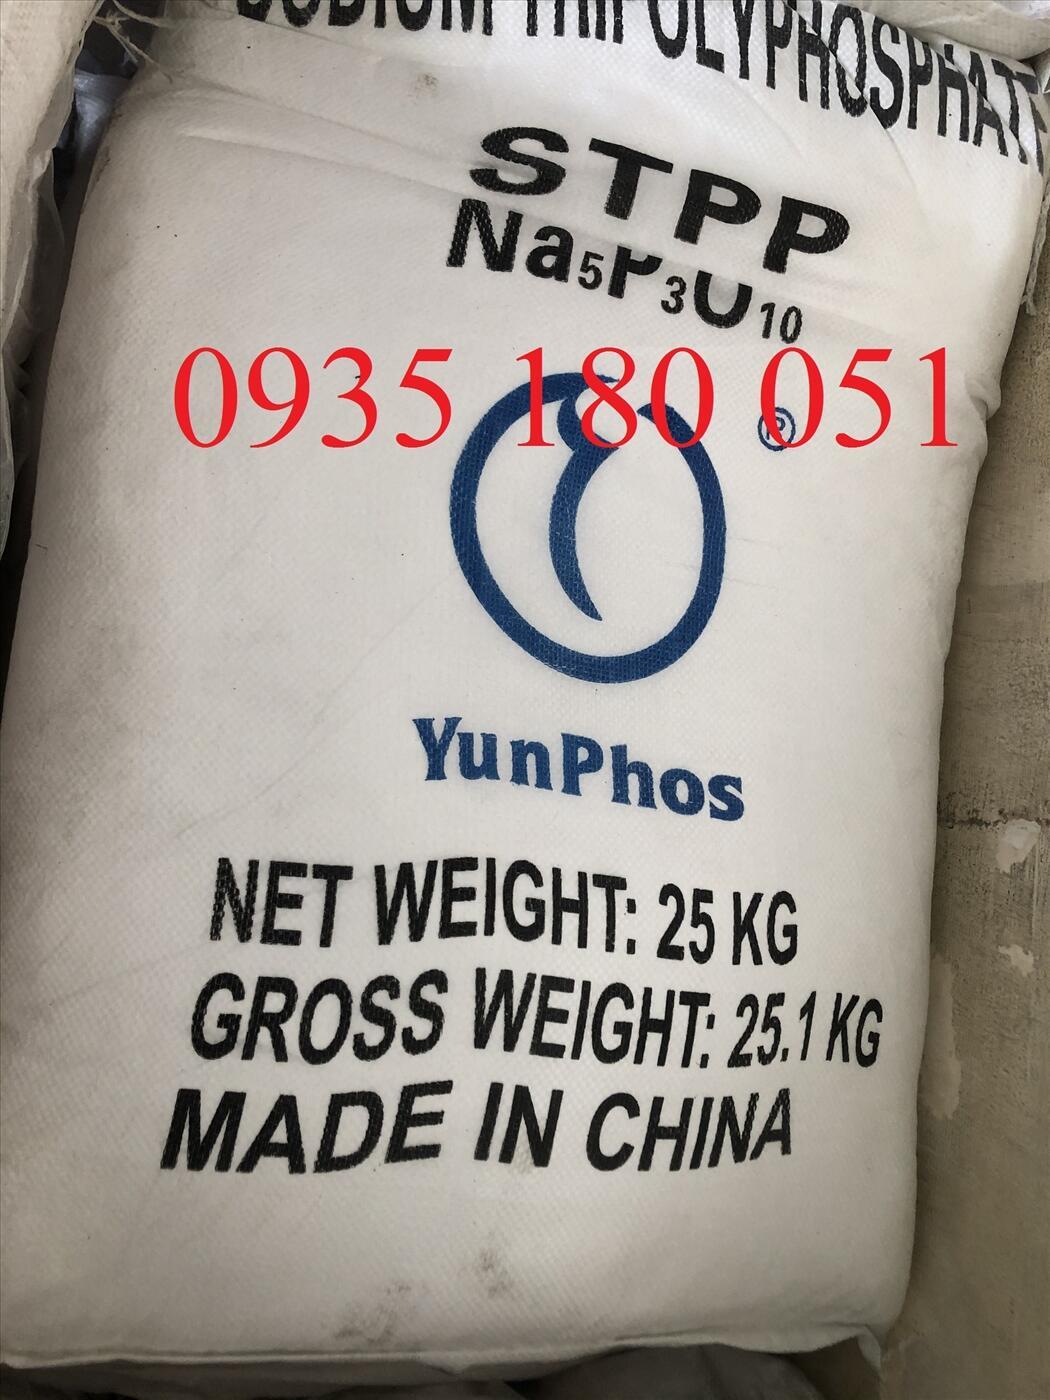 STPP - Sodium tripolyphoshatpe Na5P3O10